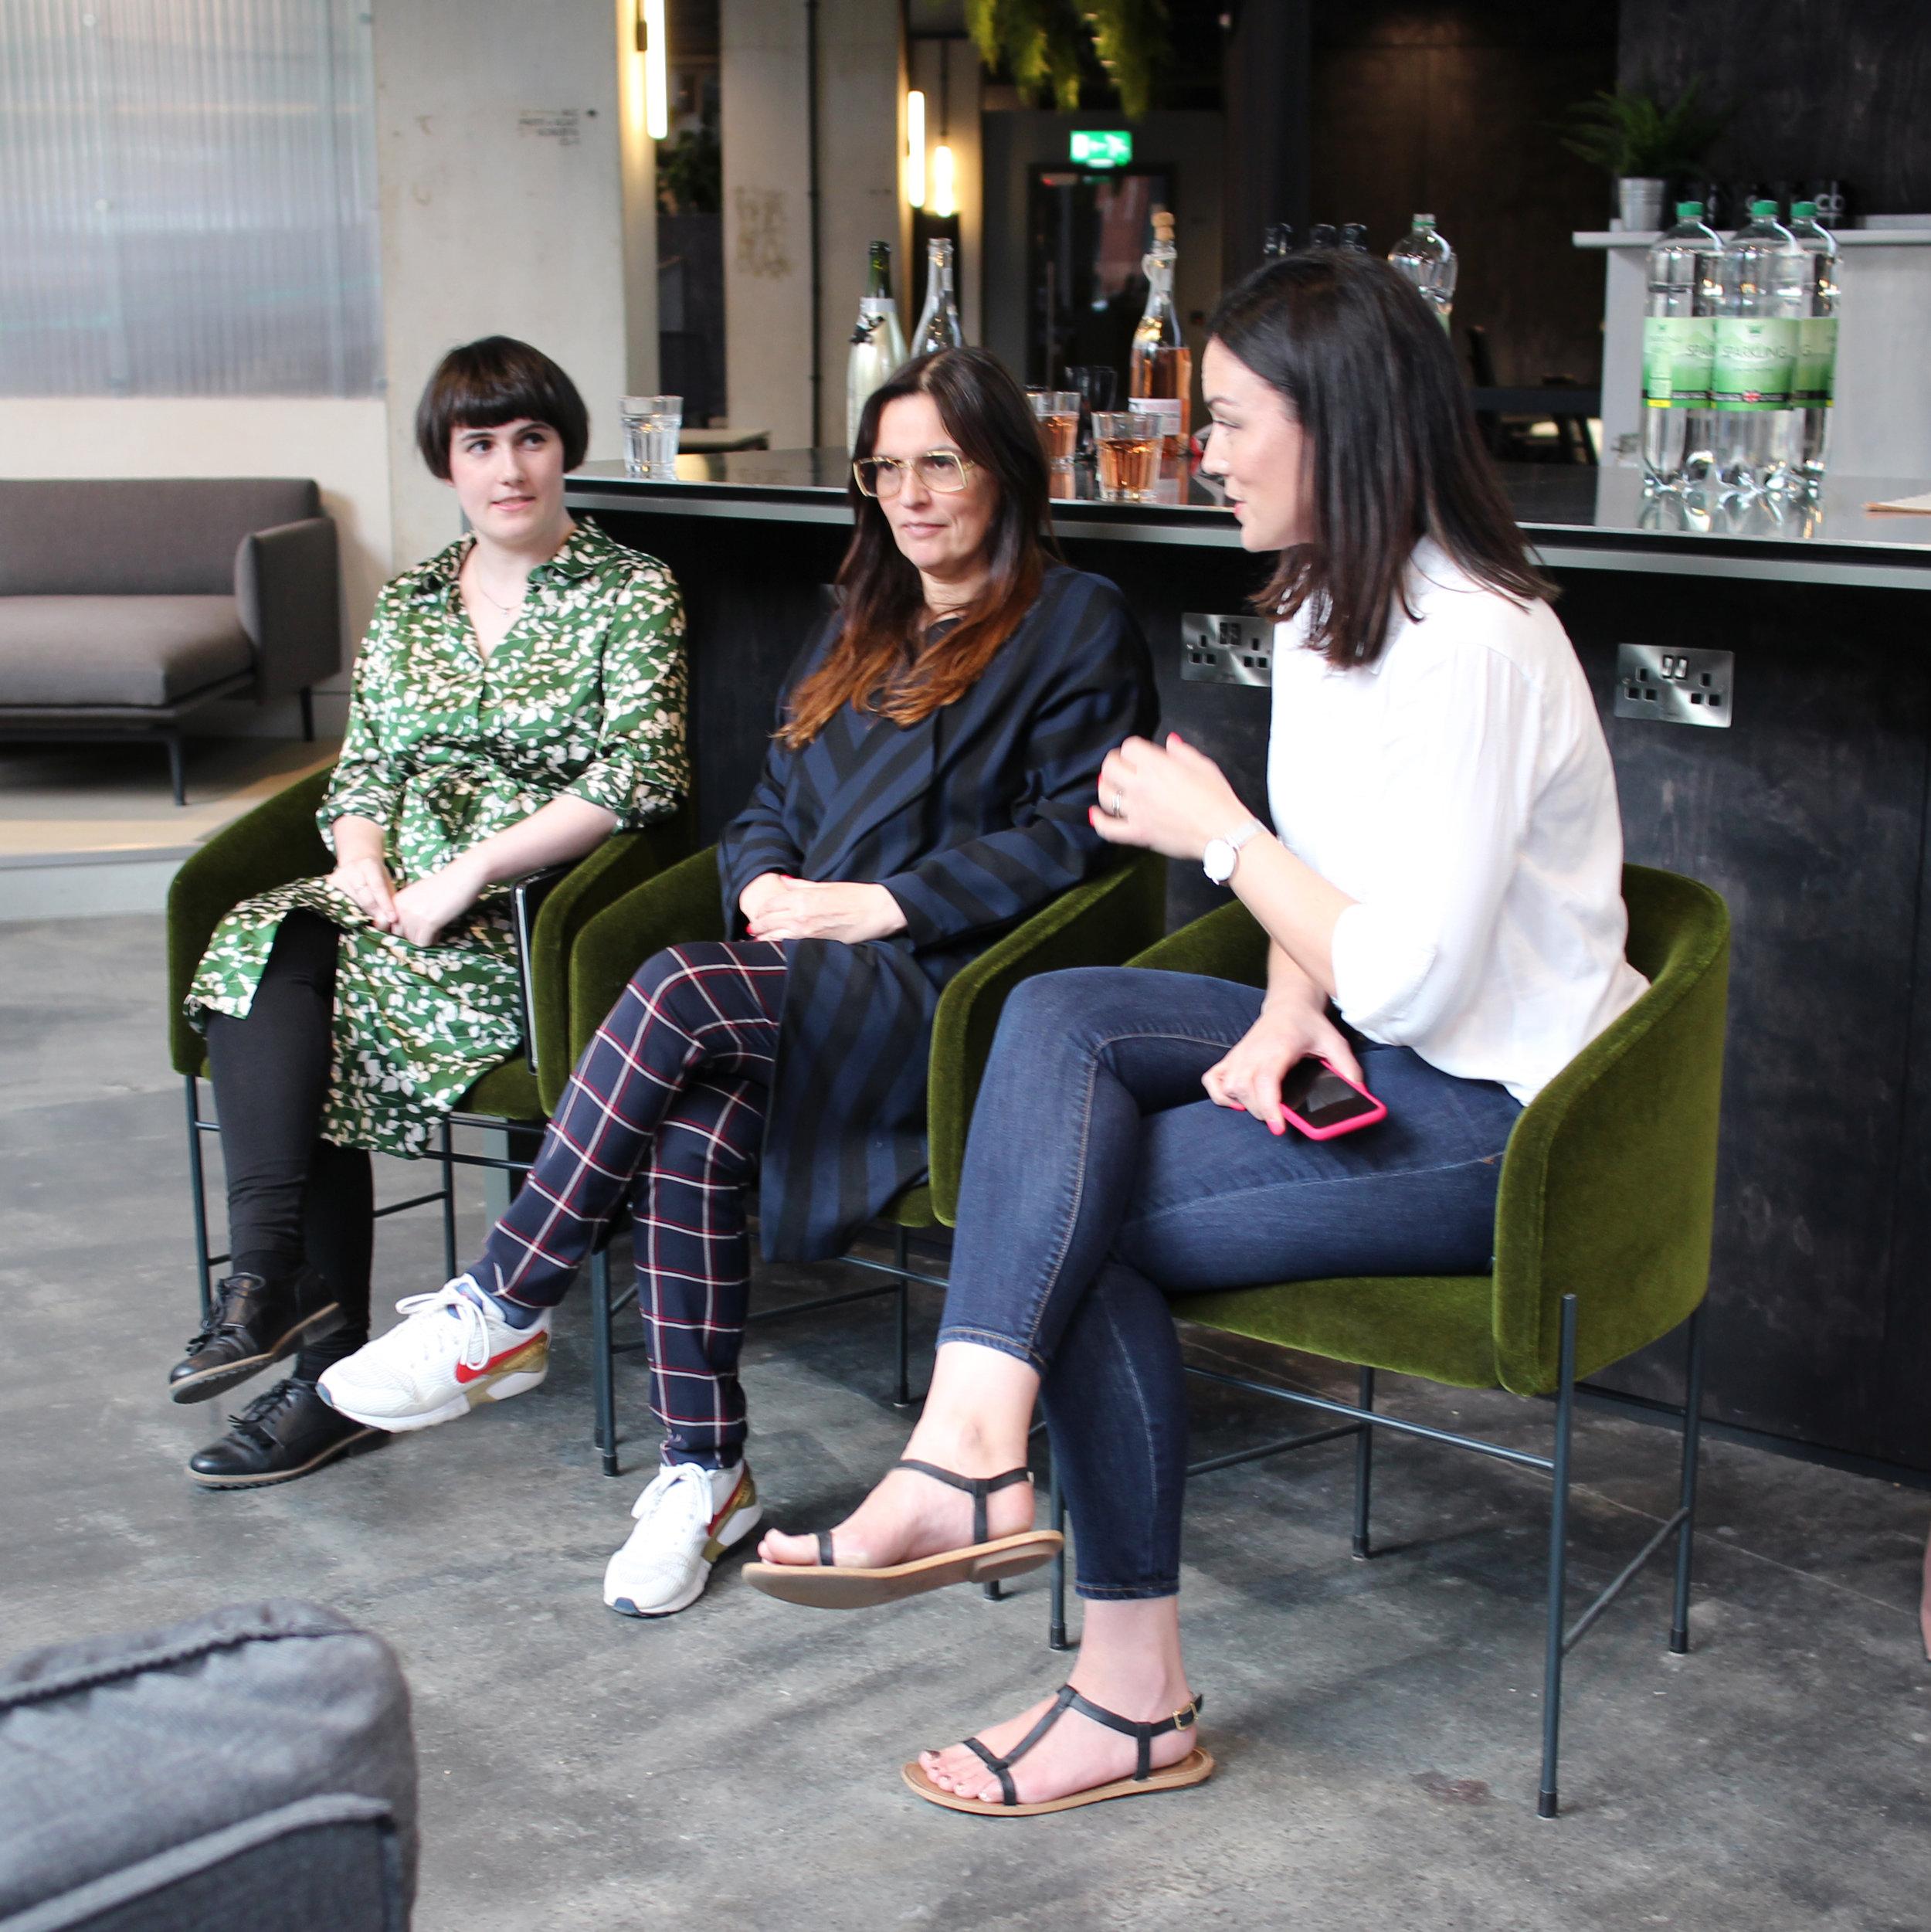 Emma, Jacqui and Katy